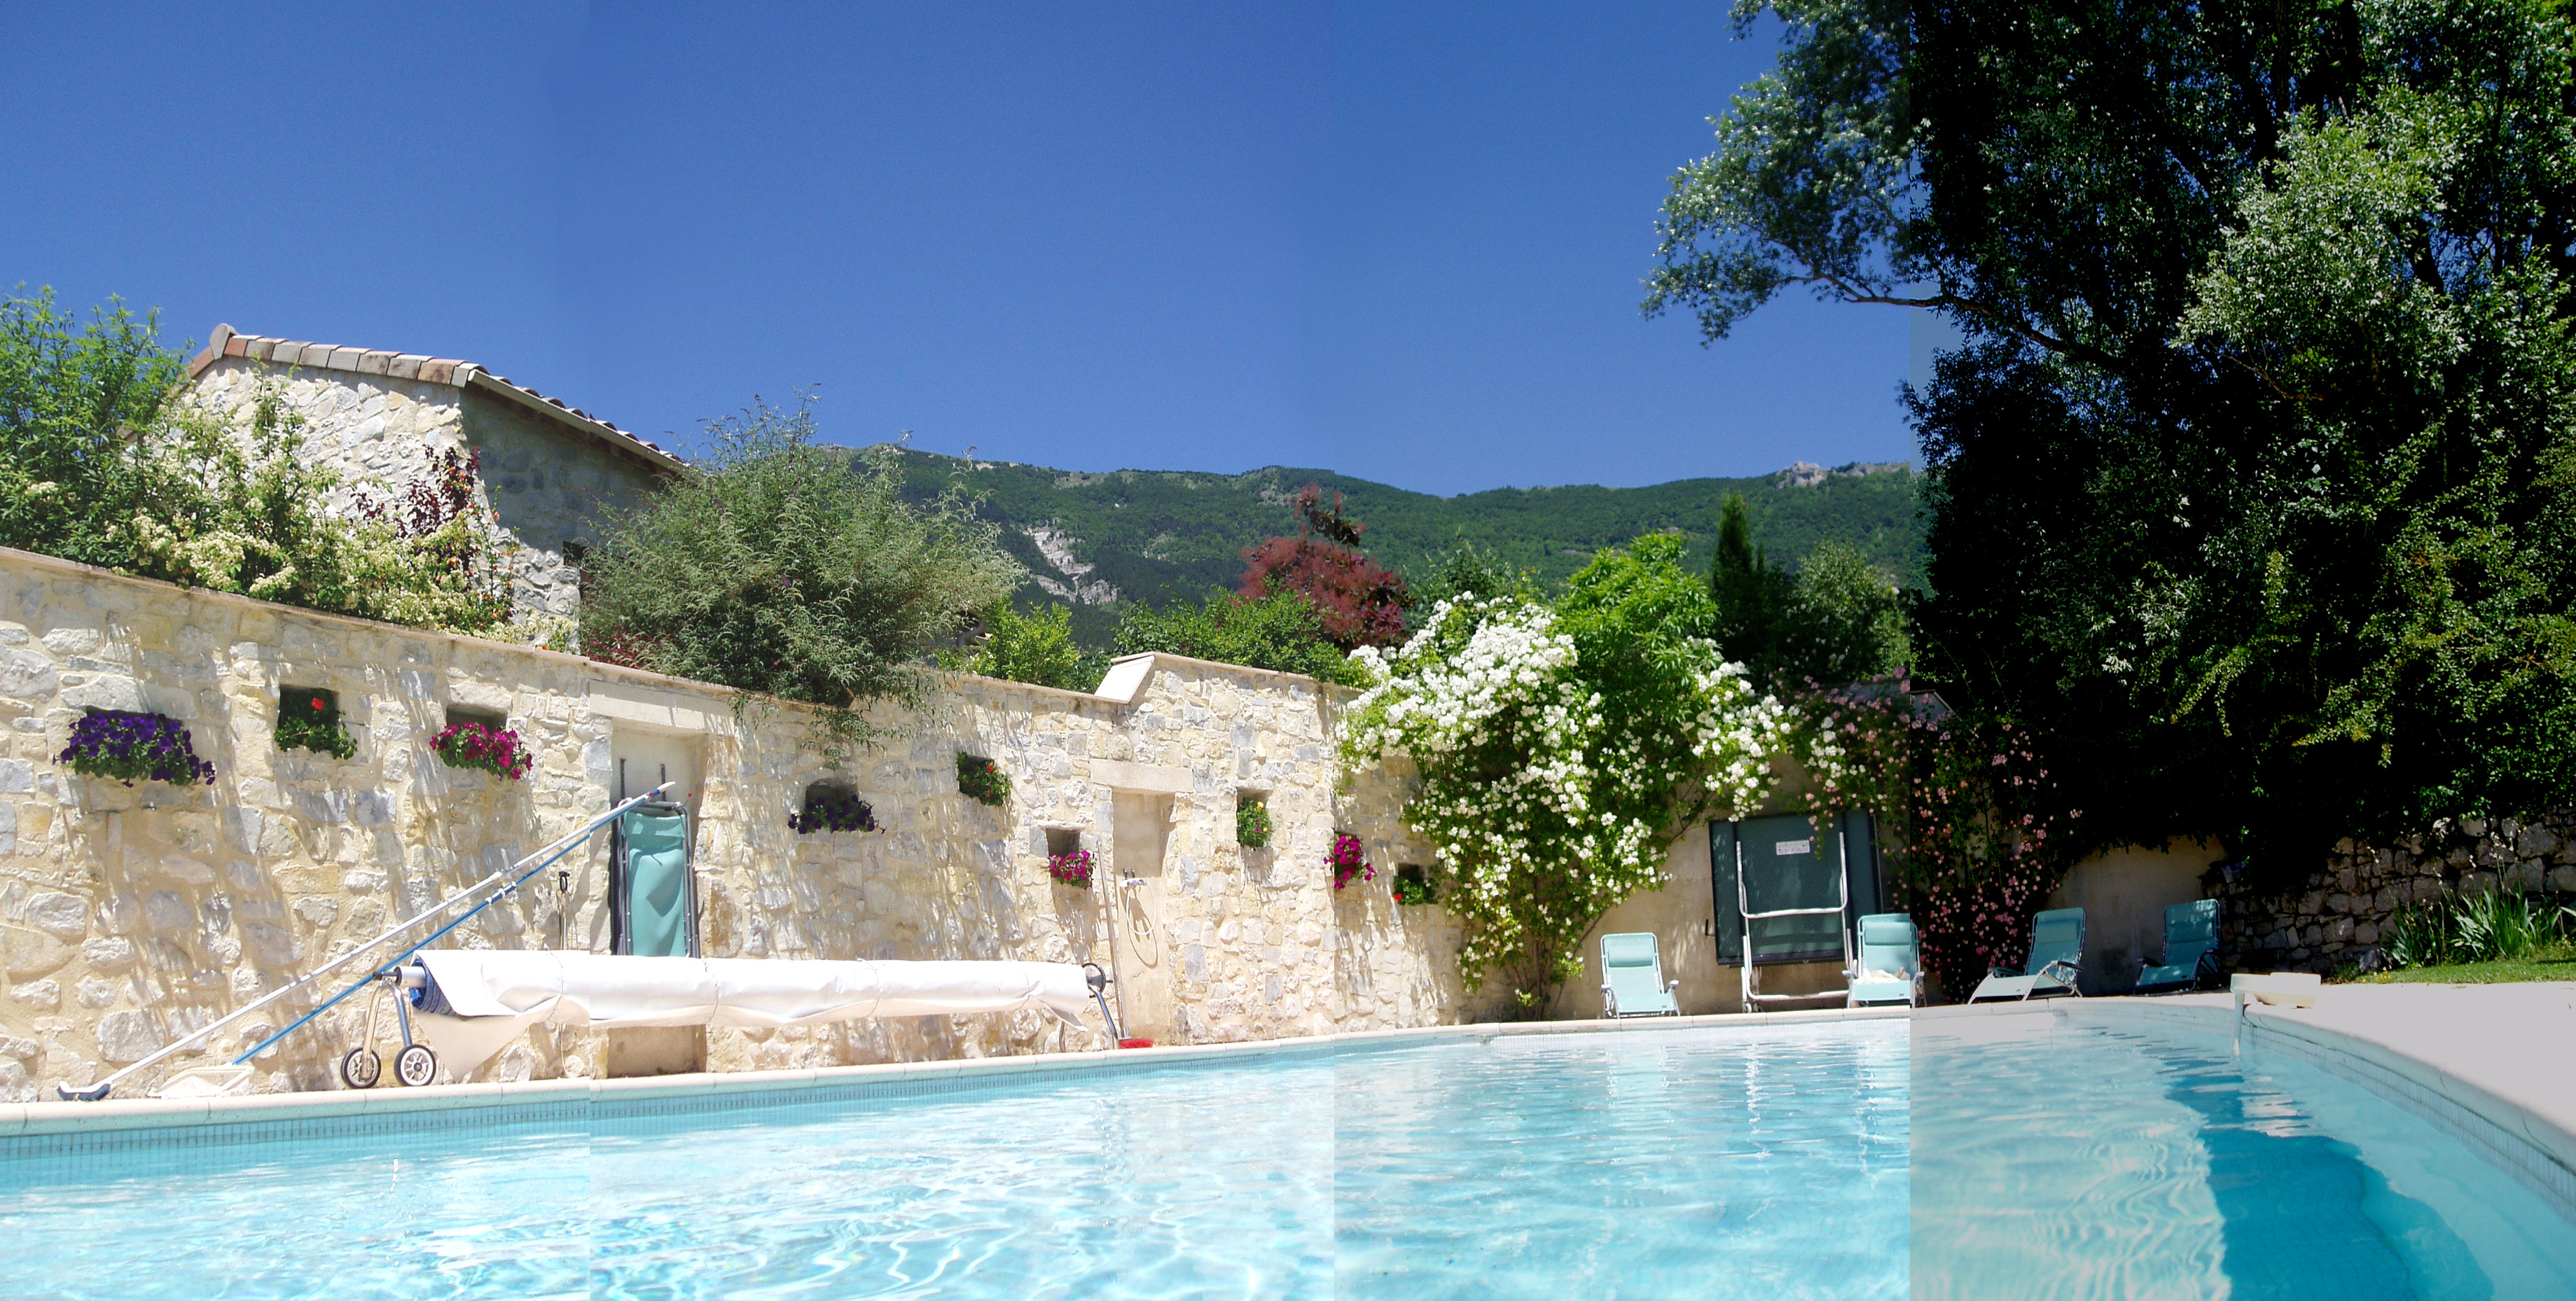 3 gites habitation principale avec piscine dans la drome - Gite dans les landes avec piscine ...